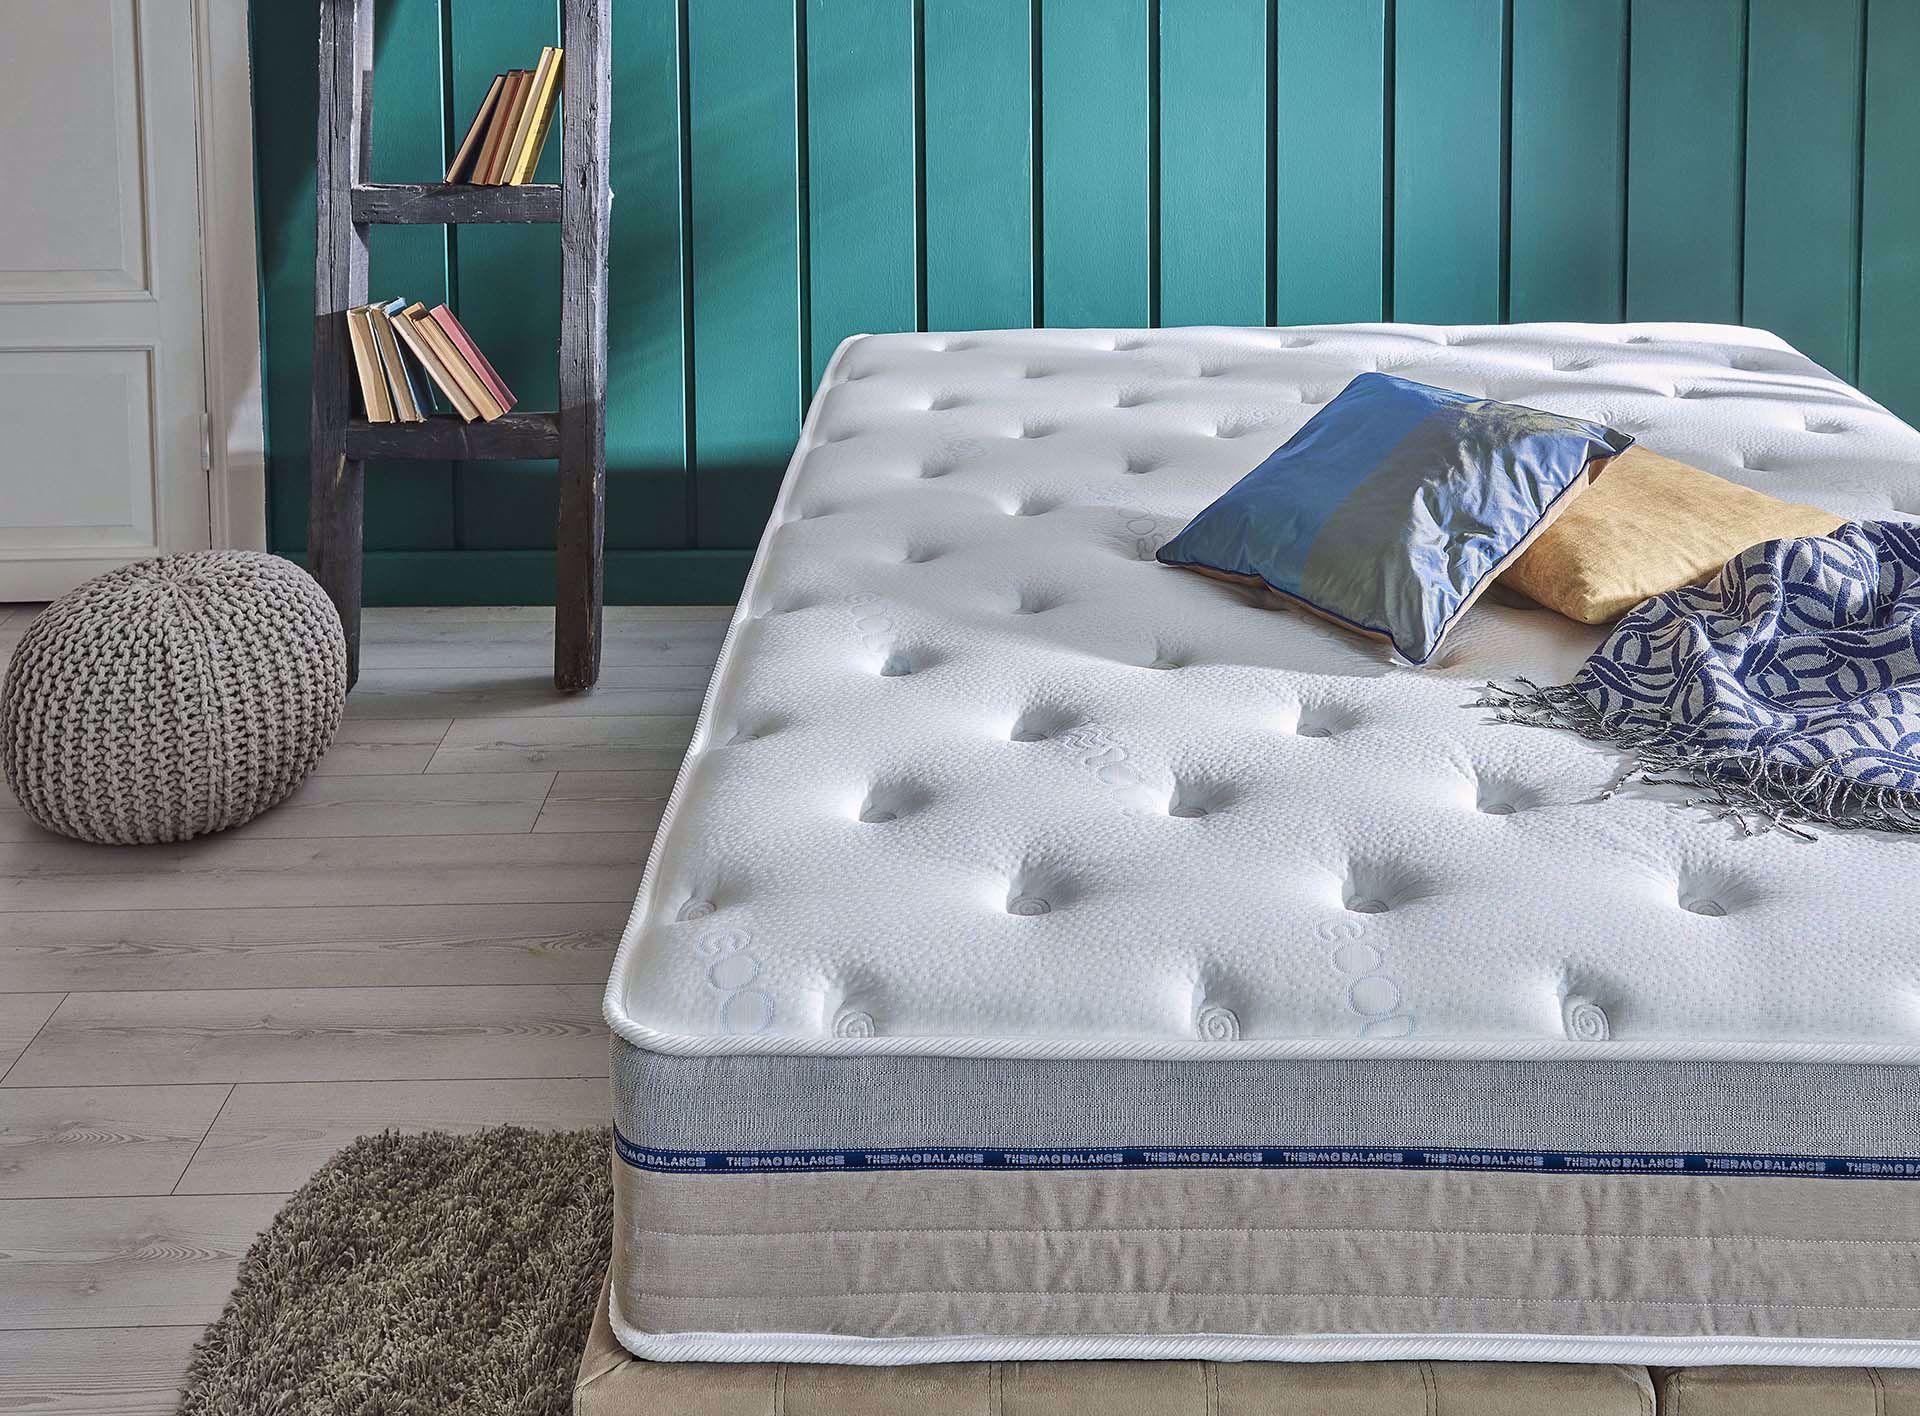 Comfort Plus Thermo Balance Yatak 180*200 cm